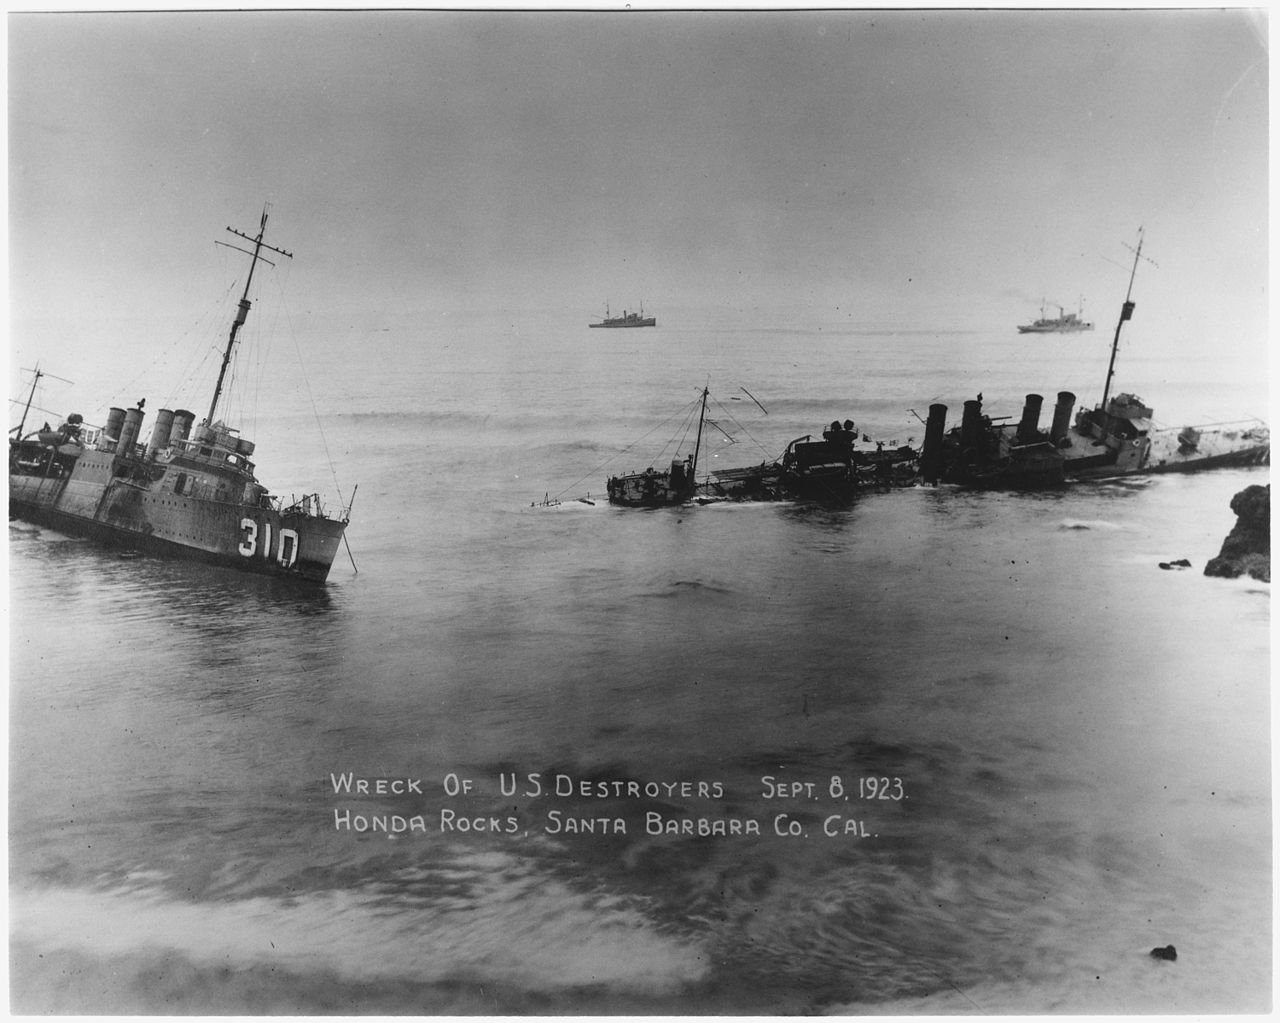 File:Wreck Of U. S. Destroyers Sept. 8, 1923. Honda Rocks, Santa Barbara  Co., California.   NARA   295610